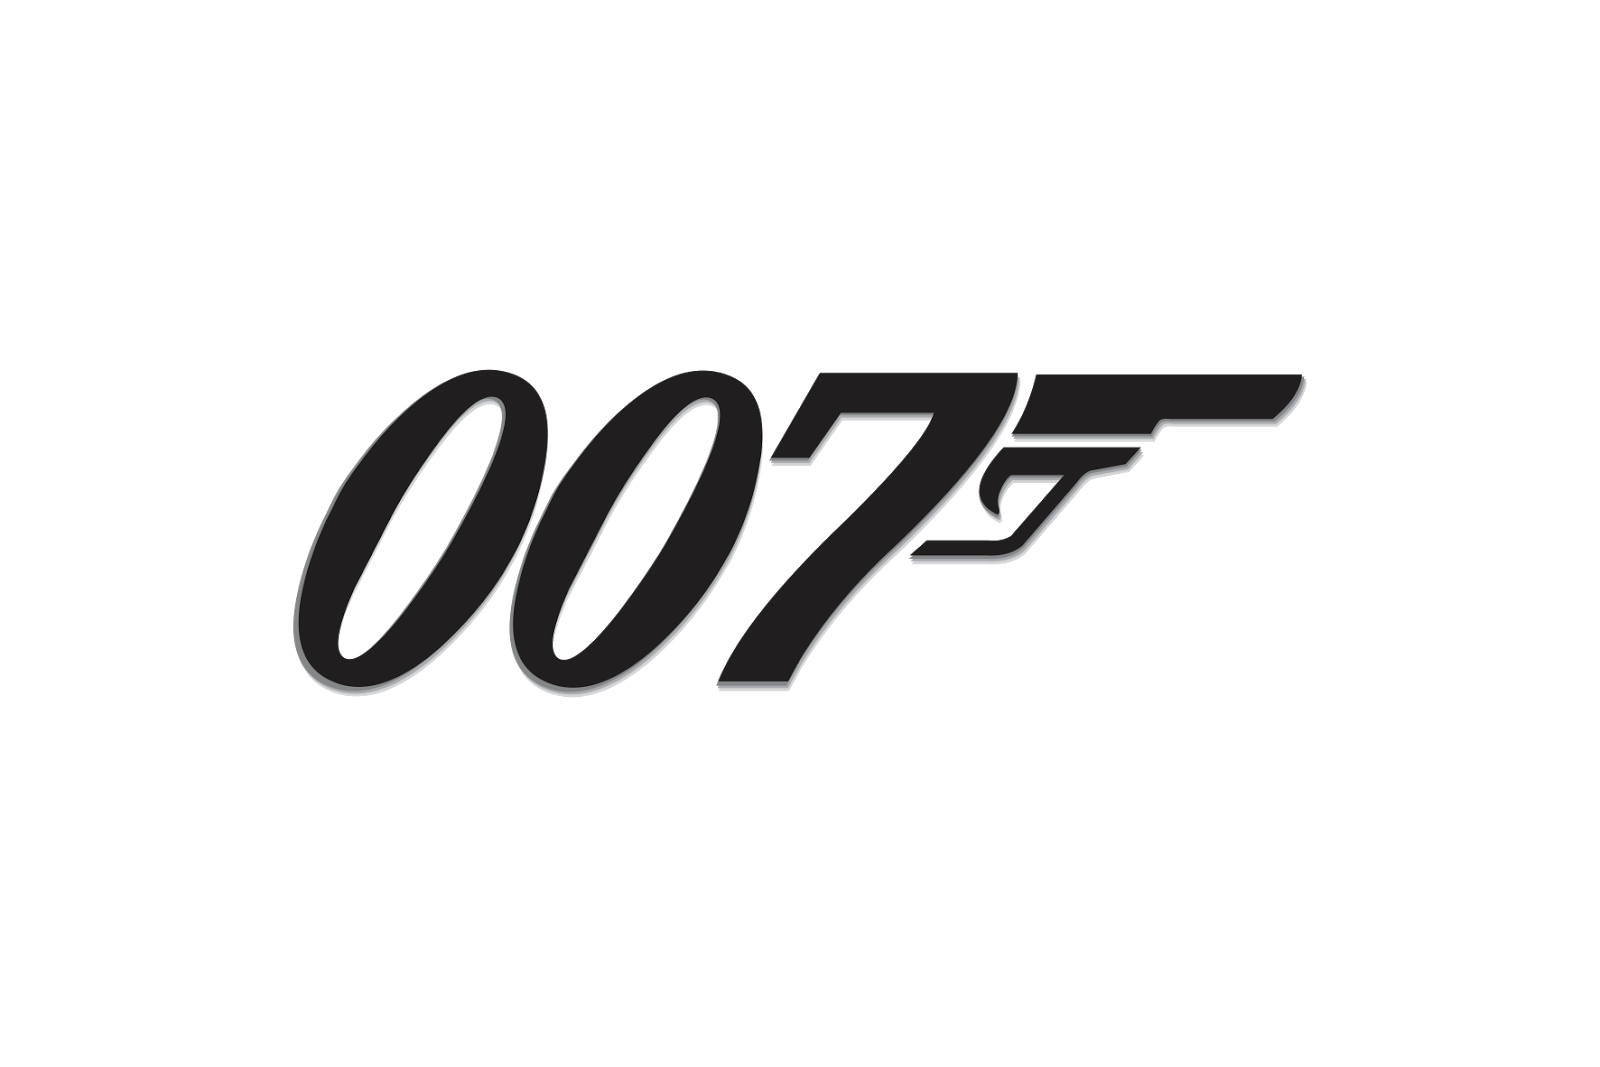 DOWNLOAD | Size... James Bond Poster Art